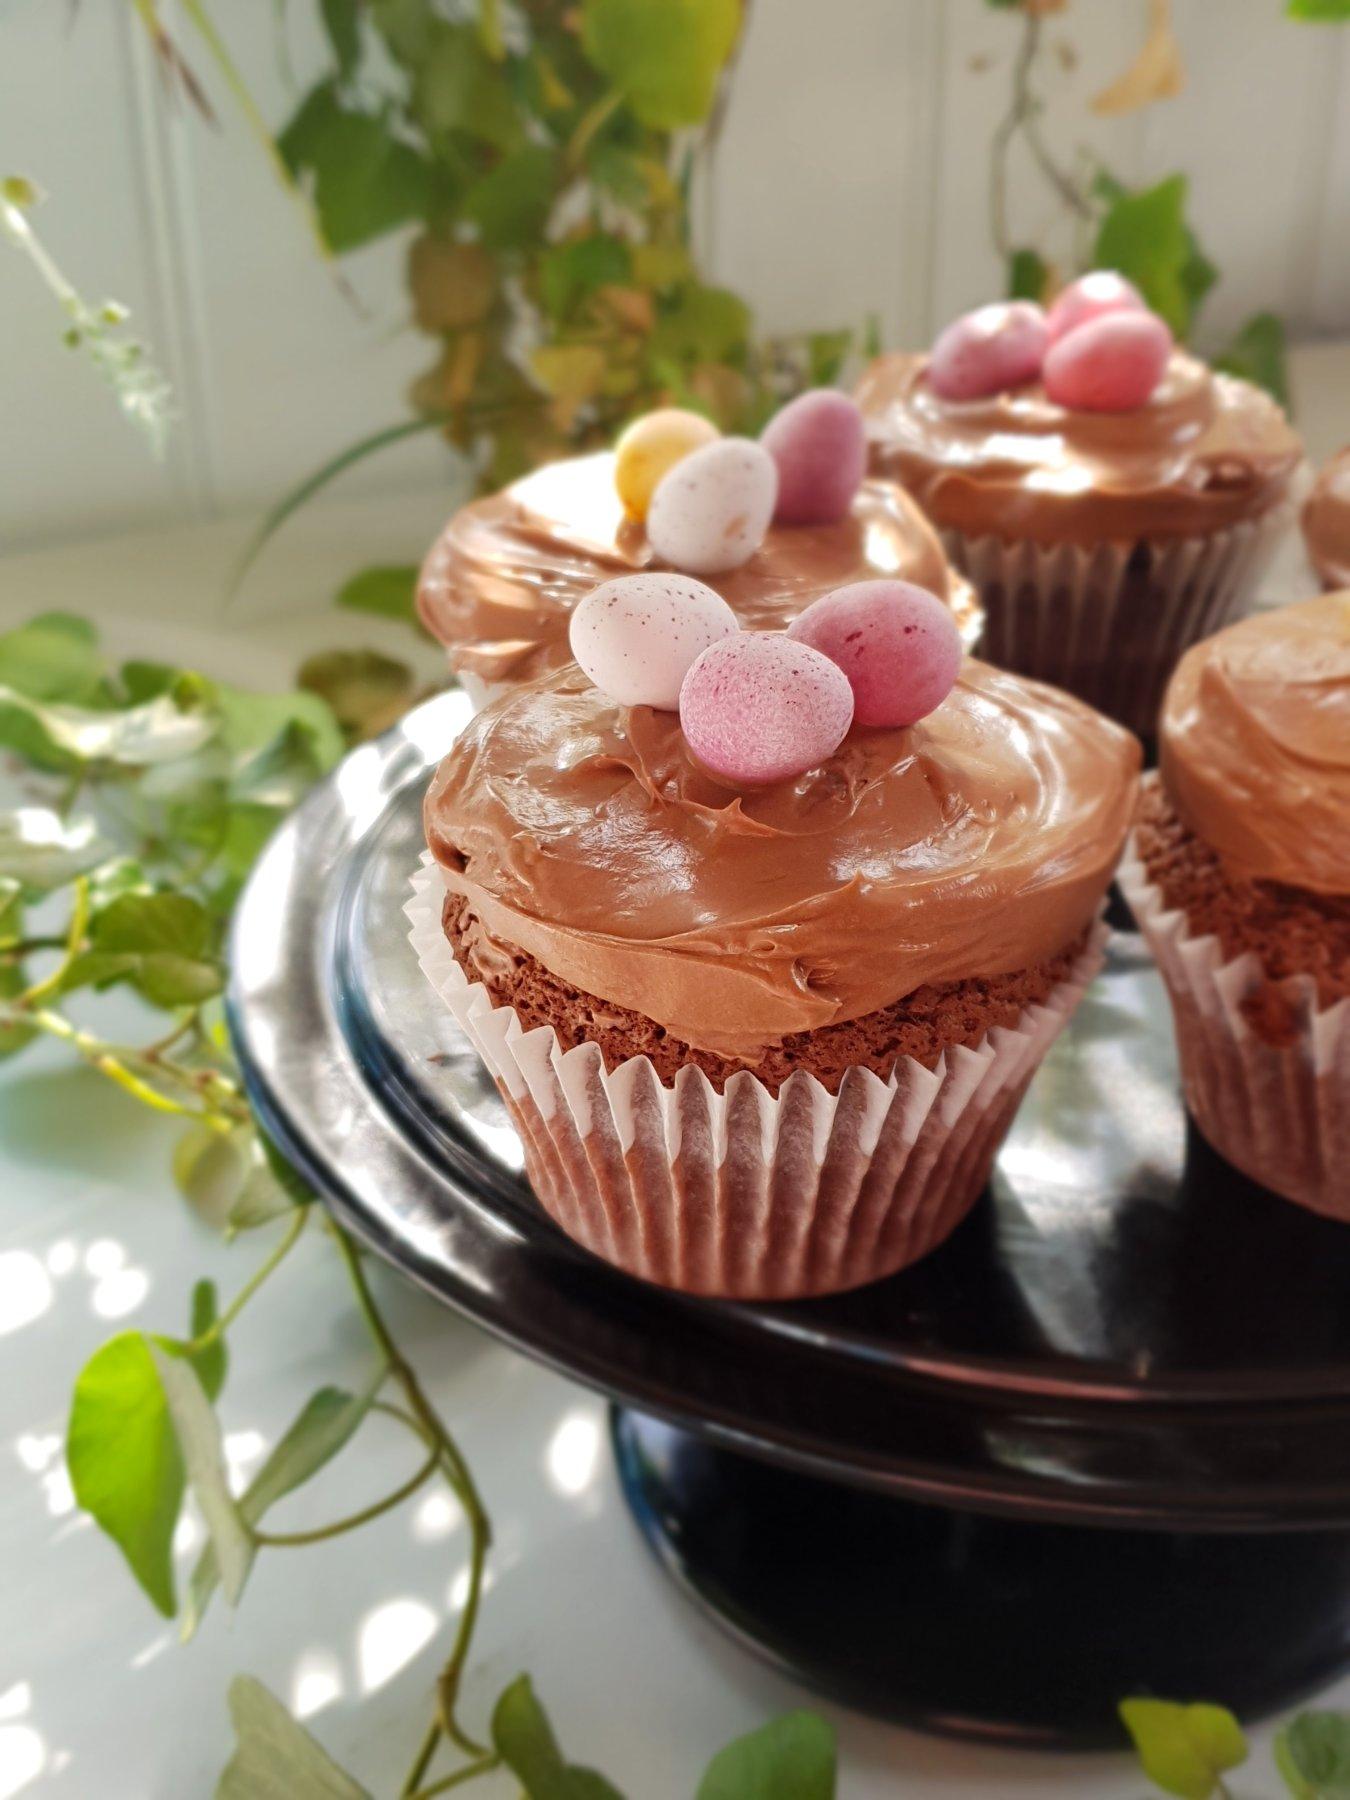 Easter Chocolate Cheesecake RecipesCupcakes